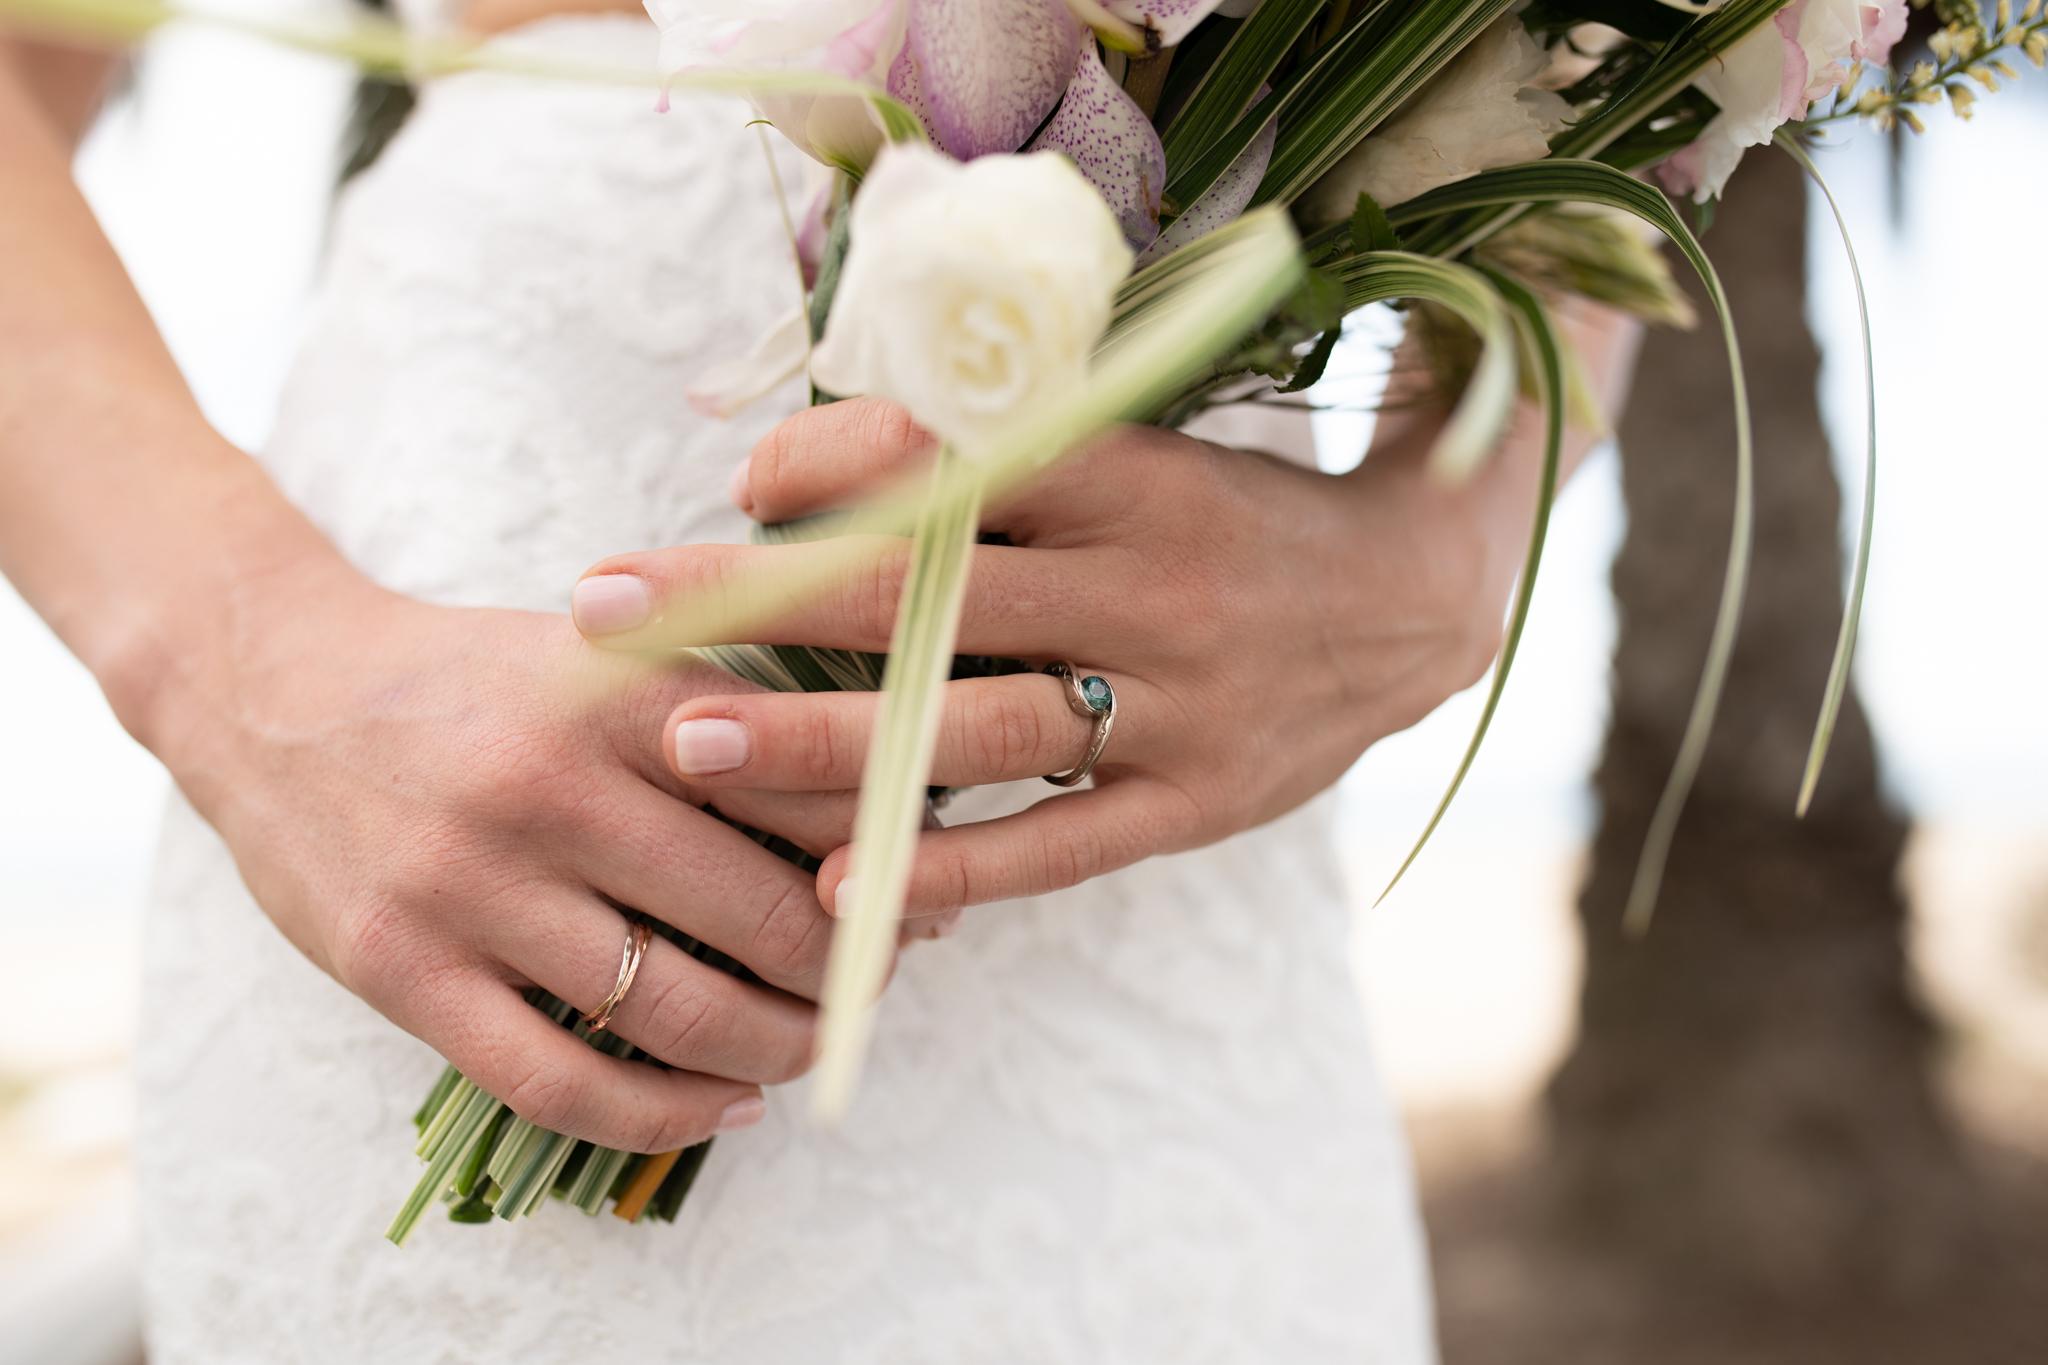 18_PRVW_Jenny_Ken_Wedding_Trevor_Hooper_Photo.jpg